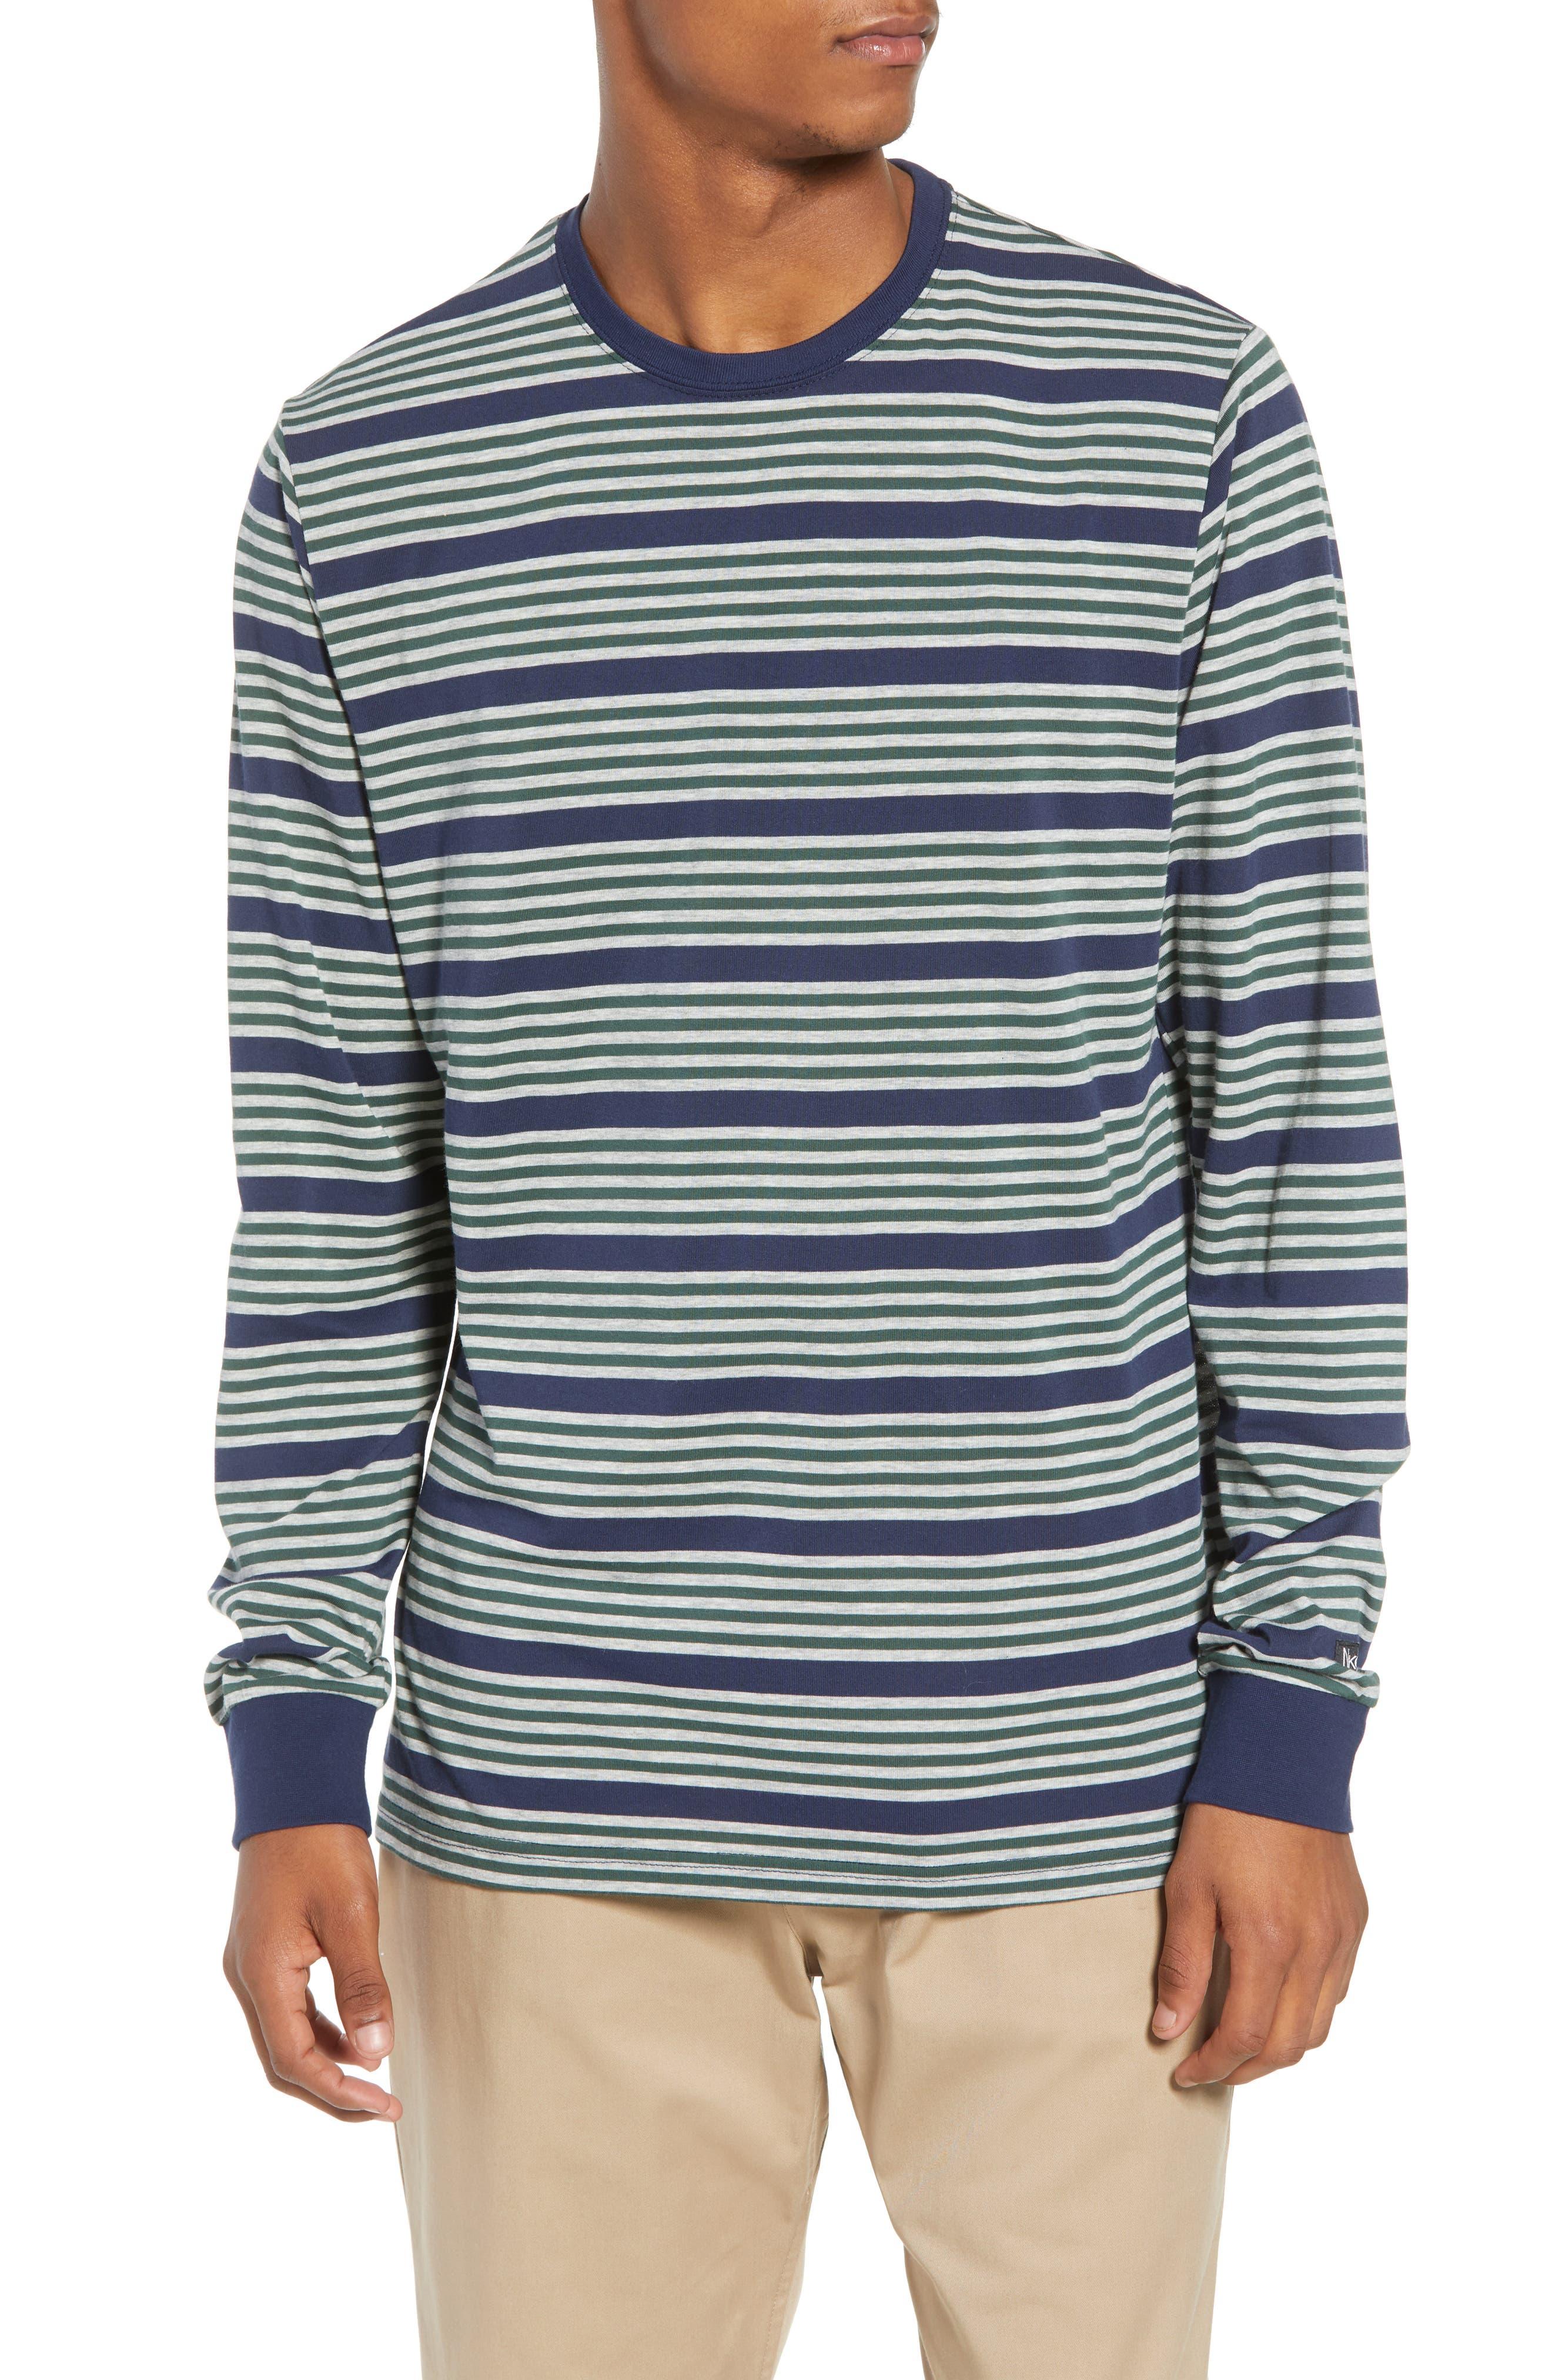 Nike Sb Dry Stripe Long Sleeve T-Shirt, Blue